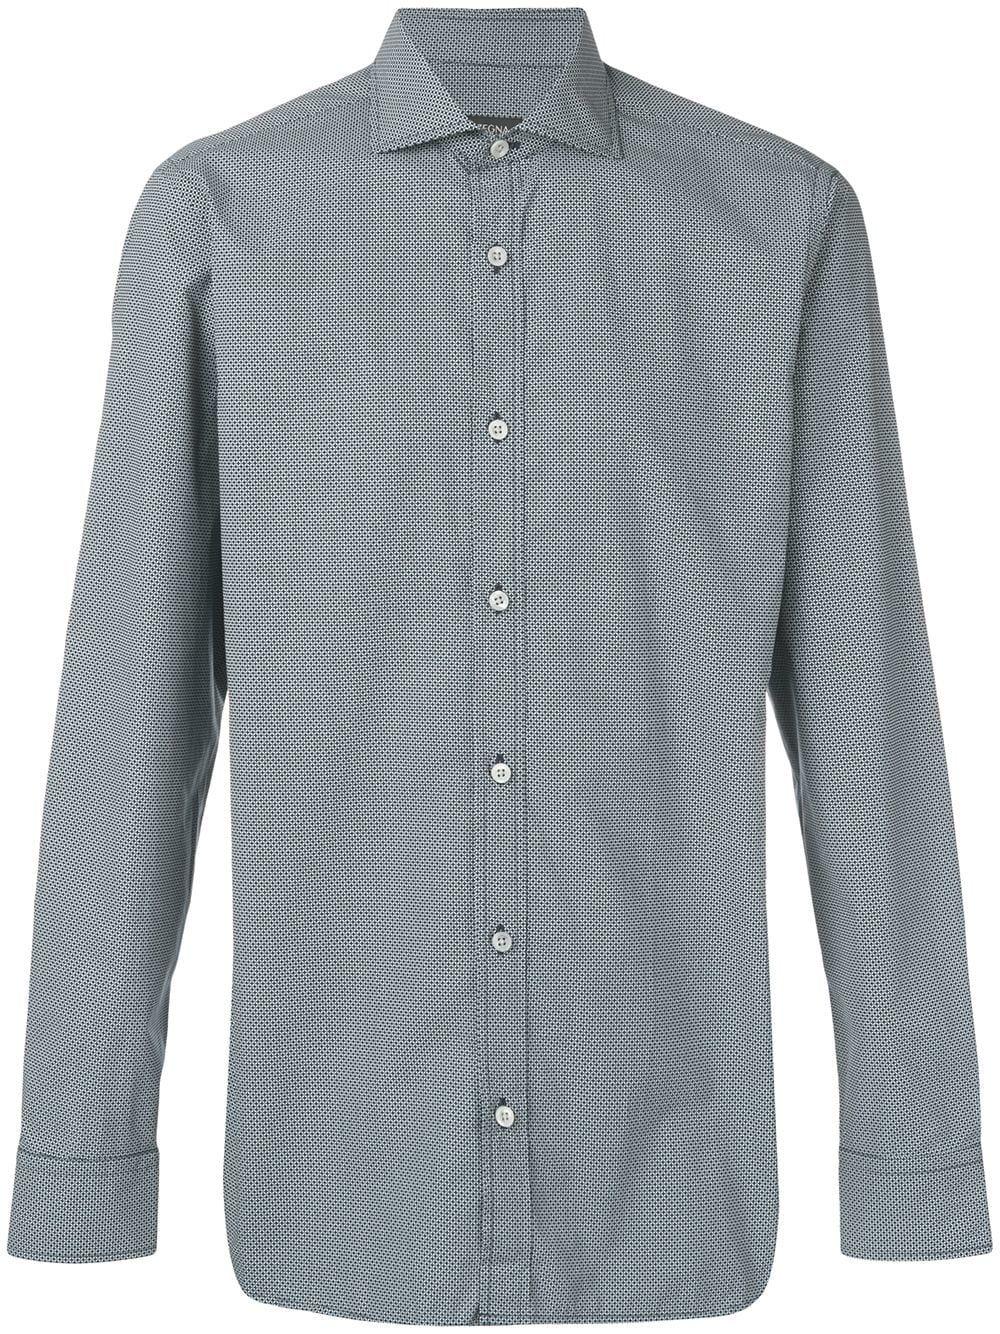 a351c6bfe Z ZEGNA Z ZEGNA PLAIN BUTTON SHIRT - BLUE. #zzegna #cloth | Z Zegna ...